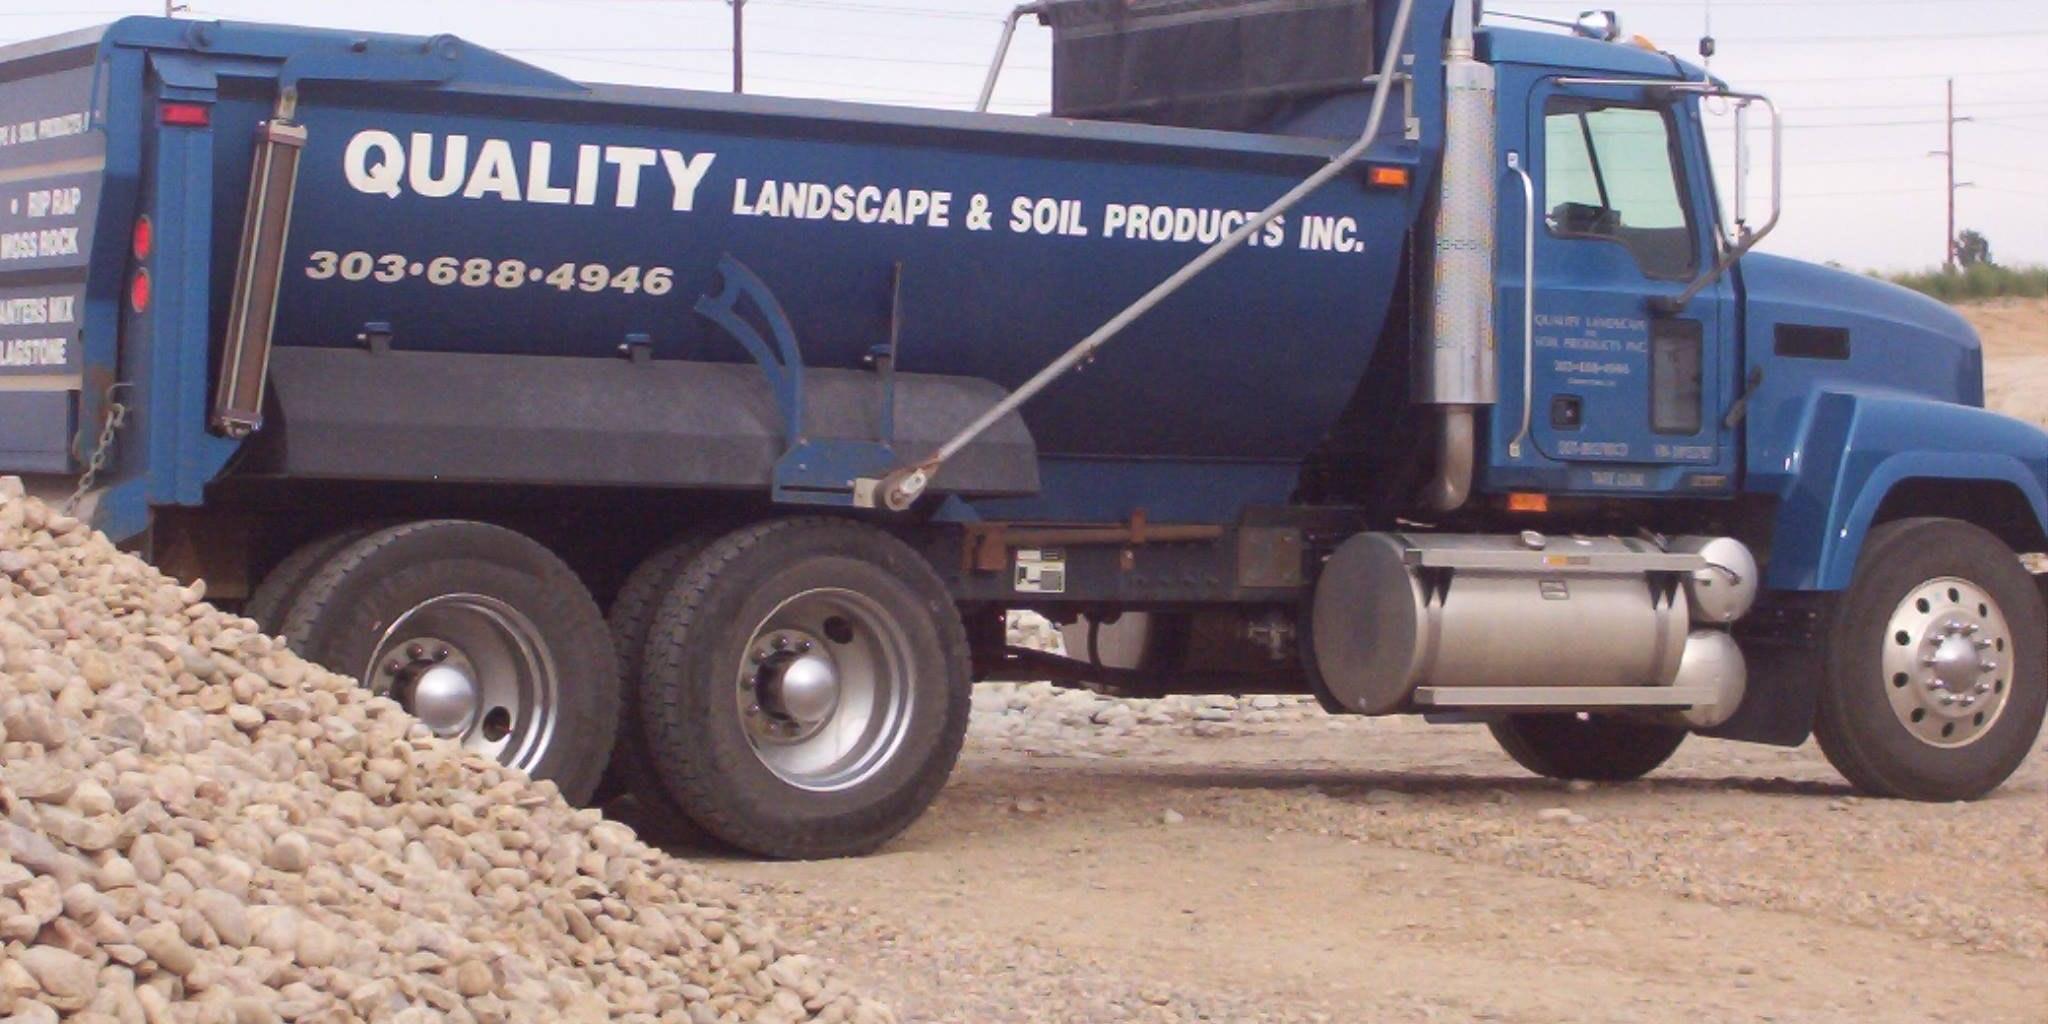 Quality Landscape & Soil Products